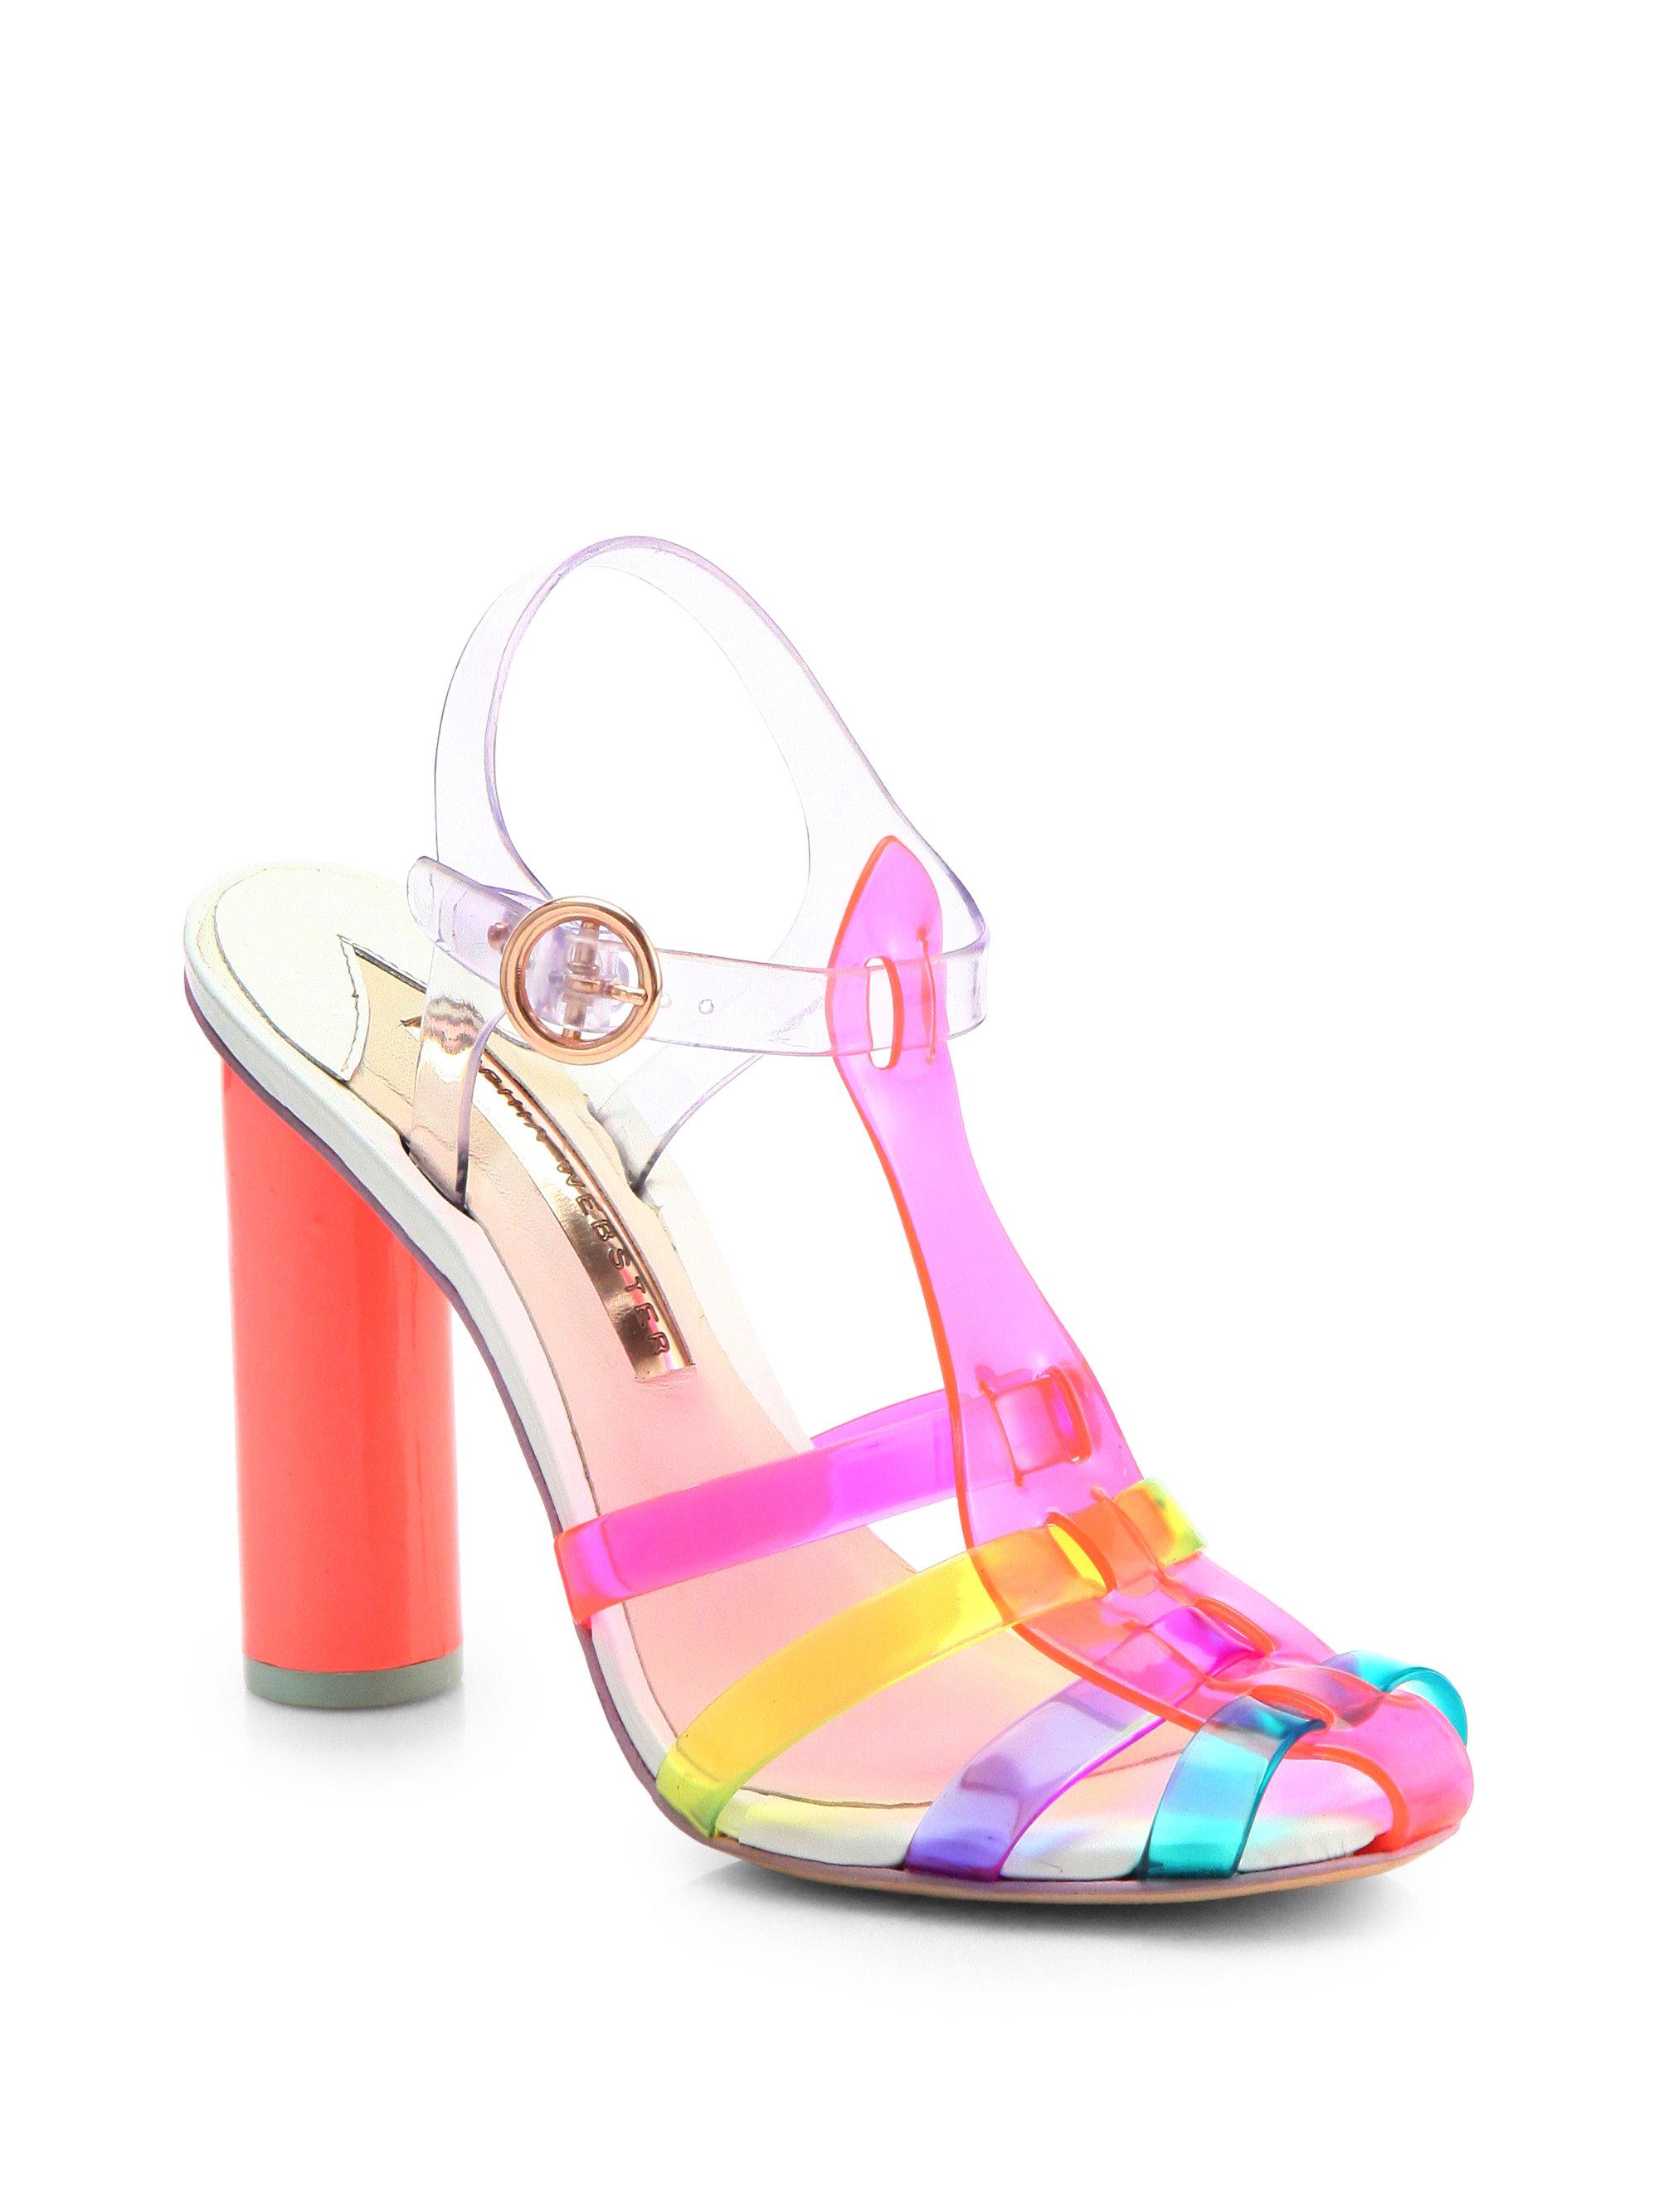 c73ccc902f37 Lyst - Sophia Webster Rosa Jelly Tstrap Sandals